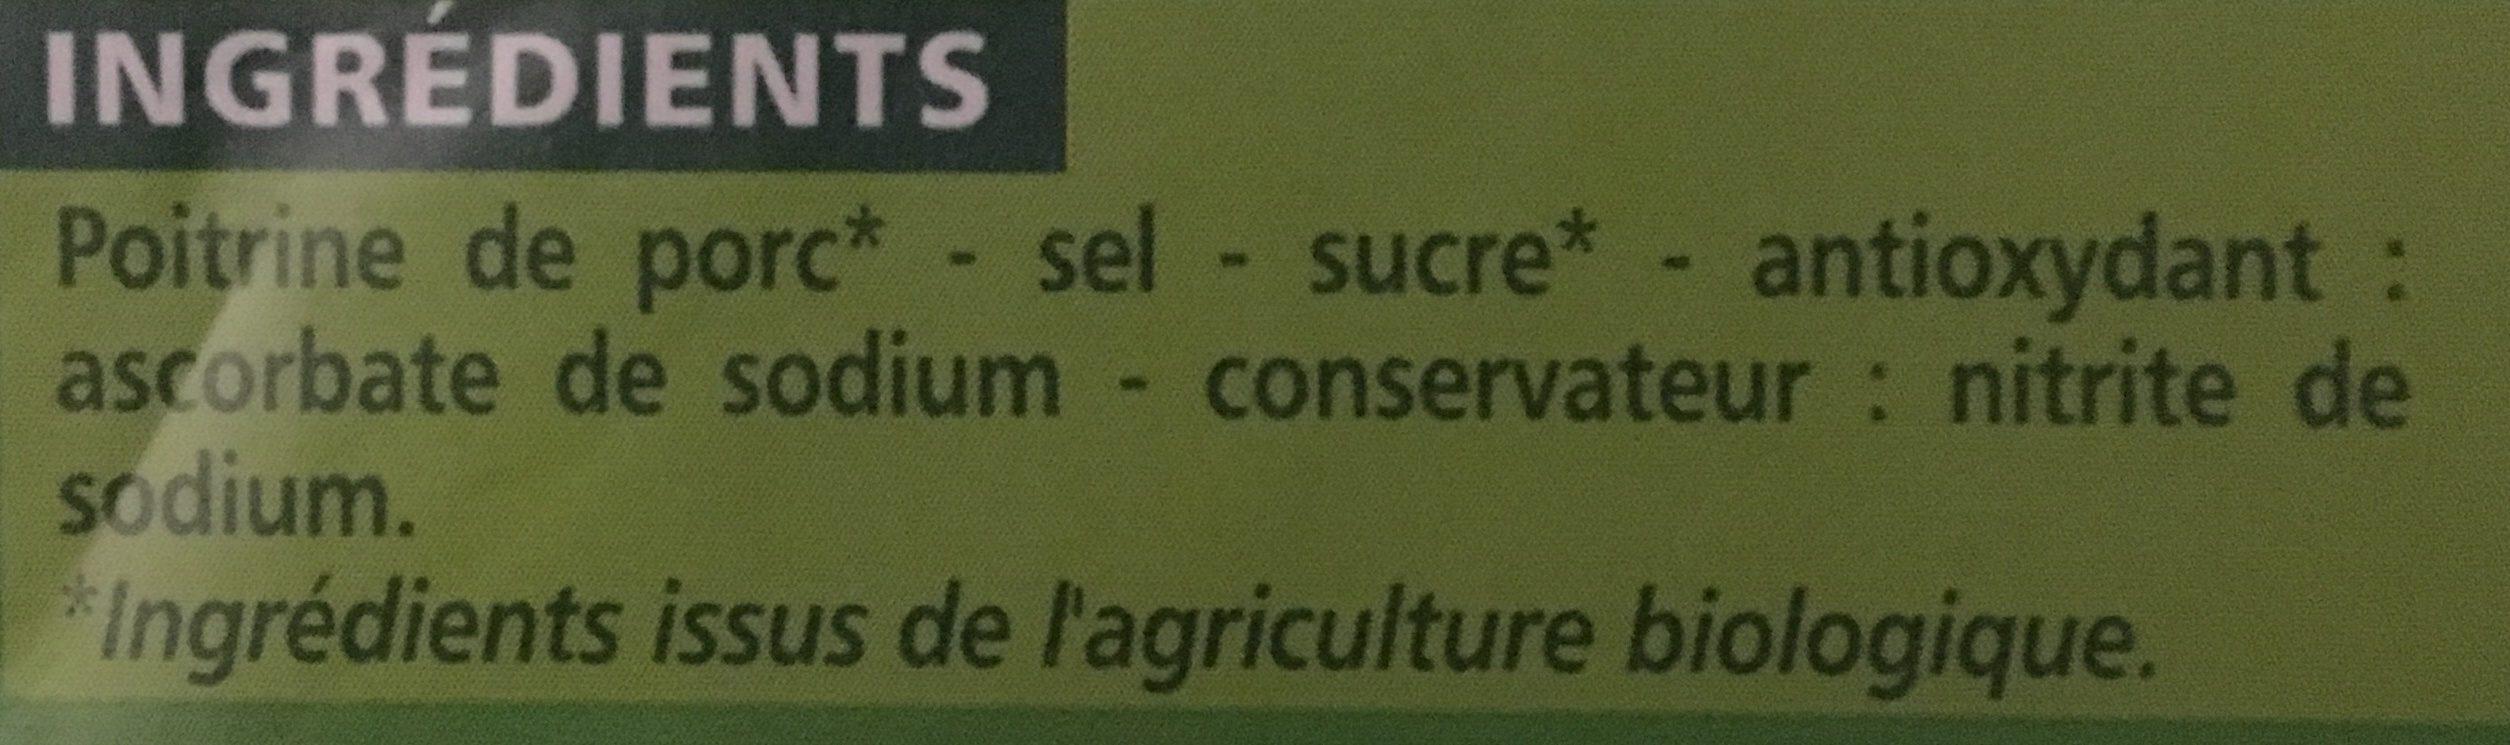 Lardons nature - Ingrédients